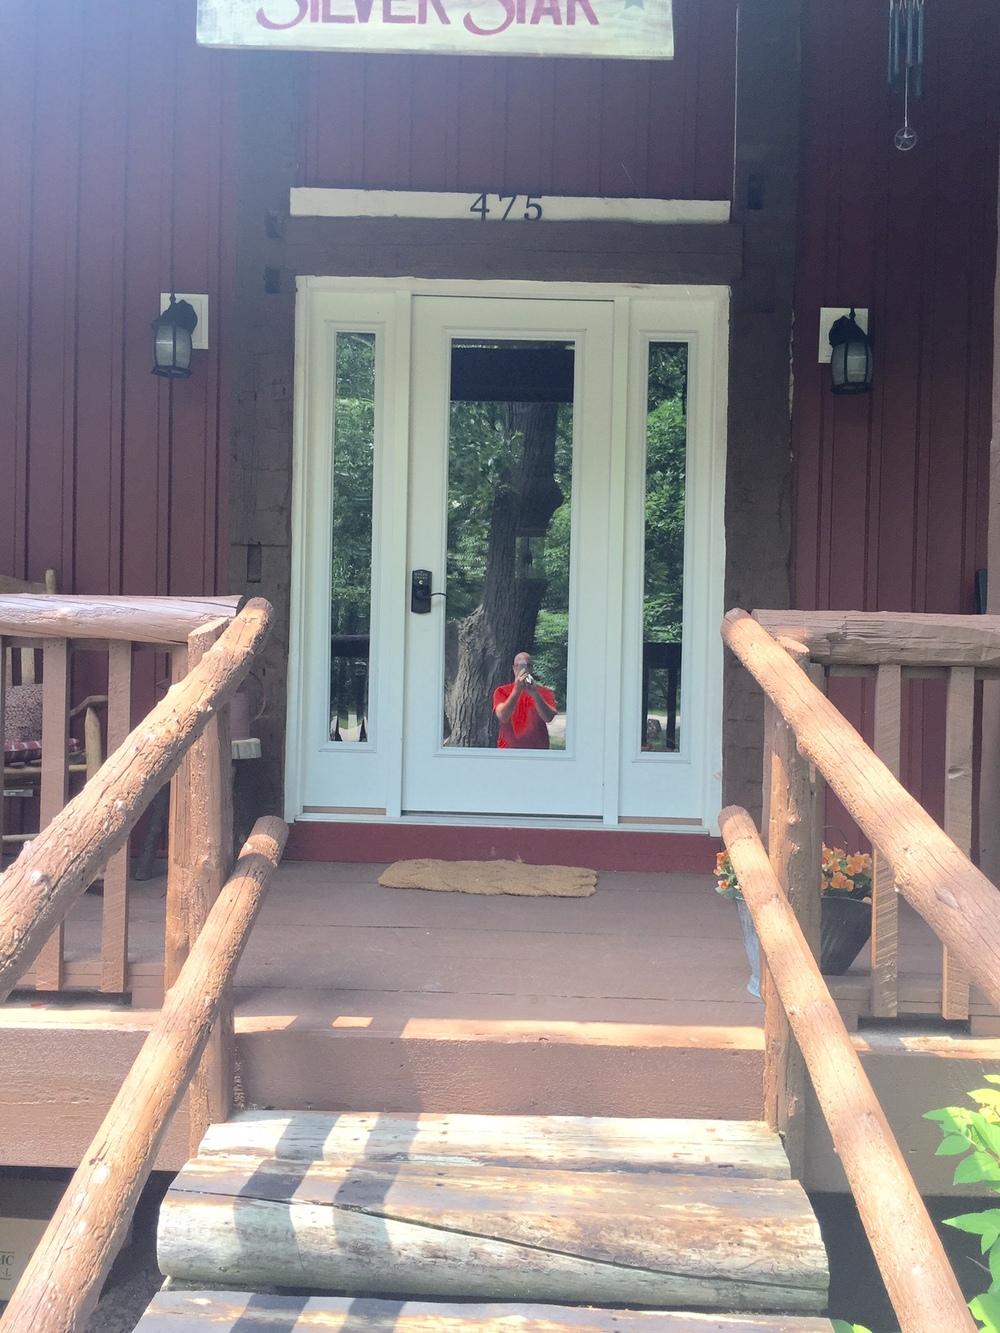 Silver Lake Michigan Silver Star Front Door.jpg